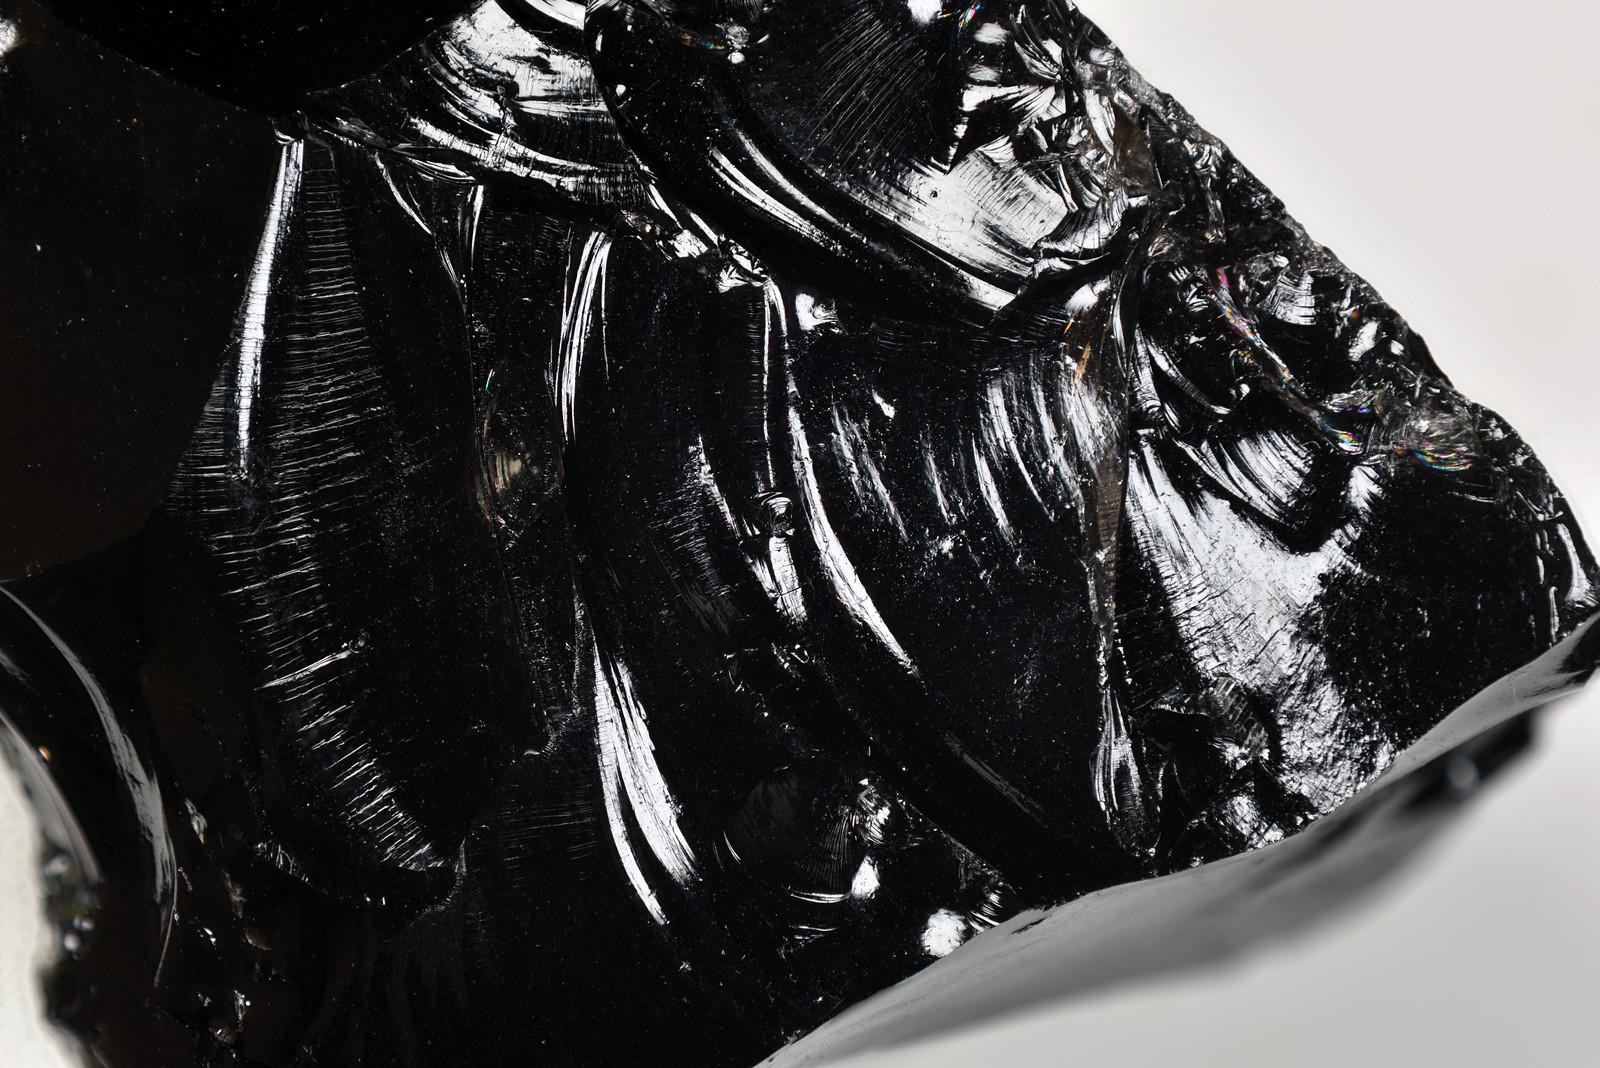 黒曜石 / Obsidian